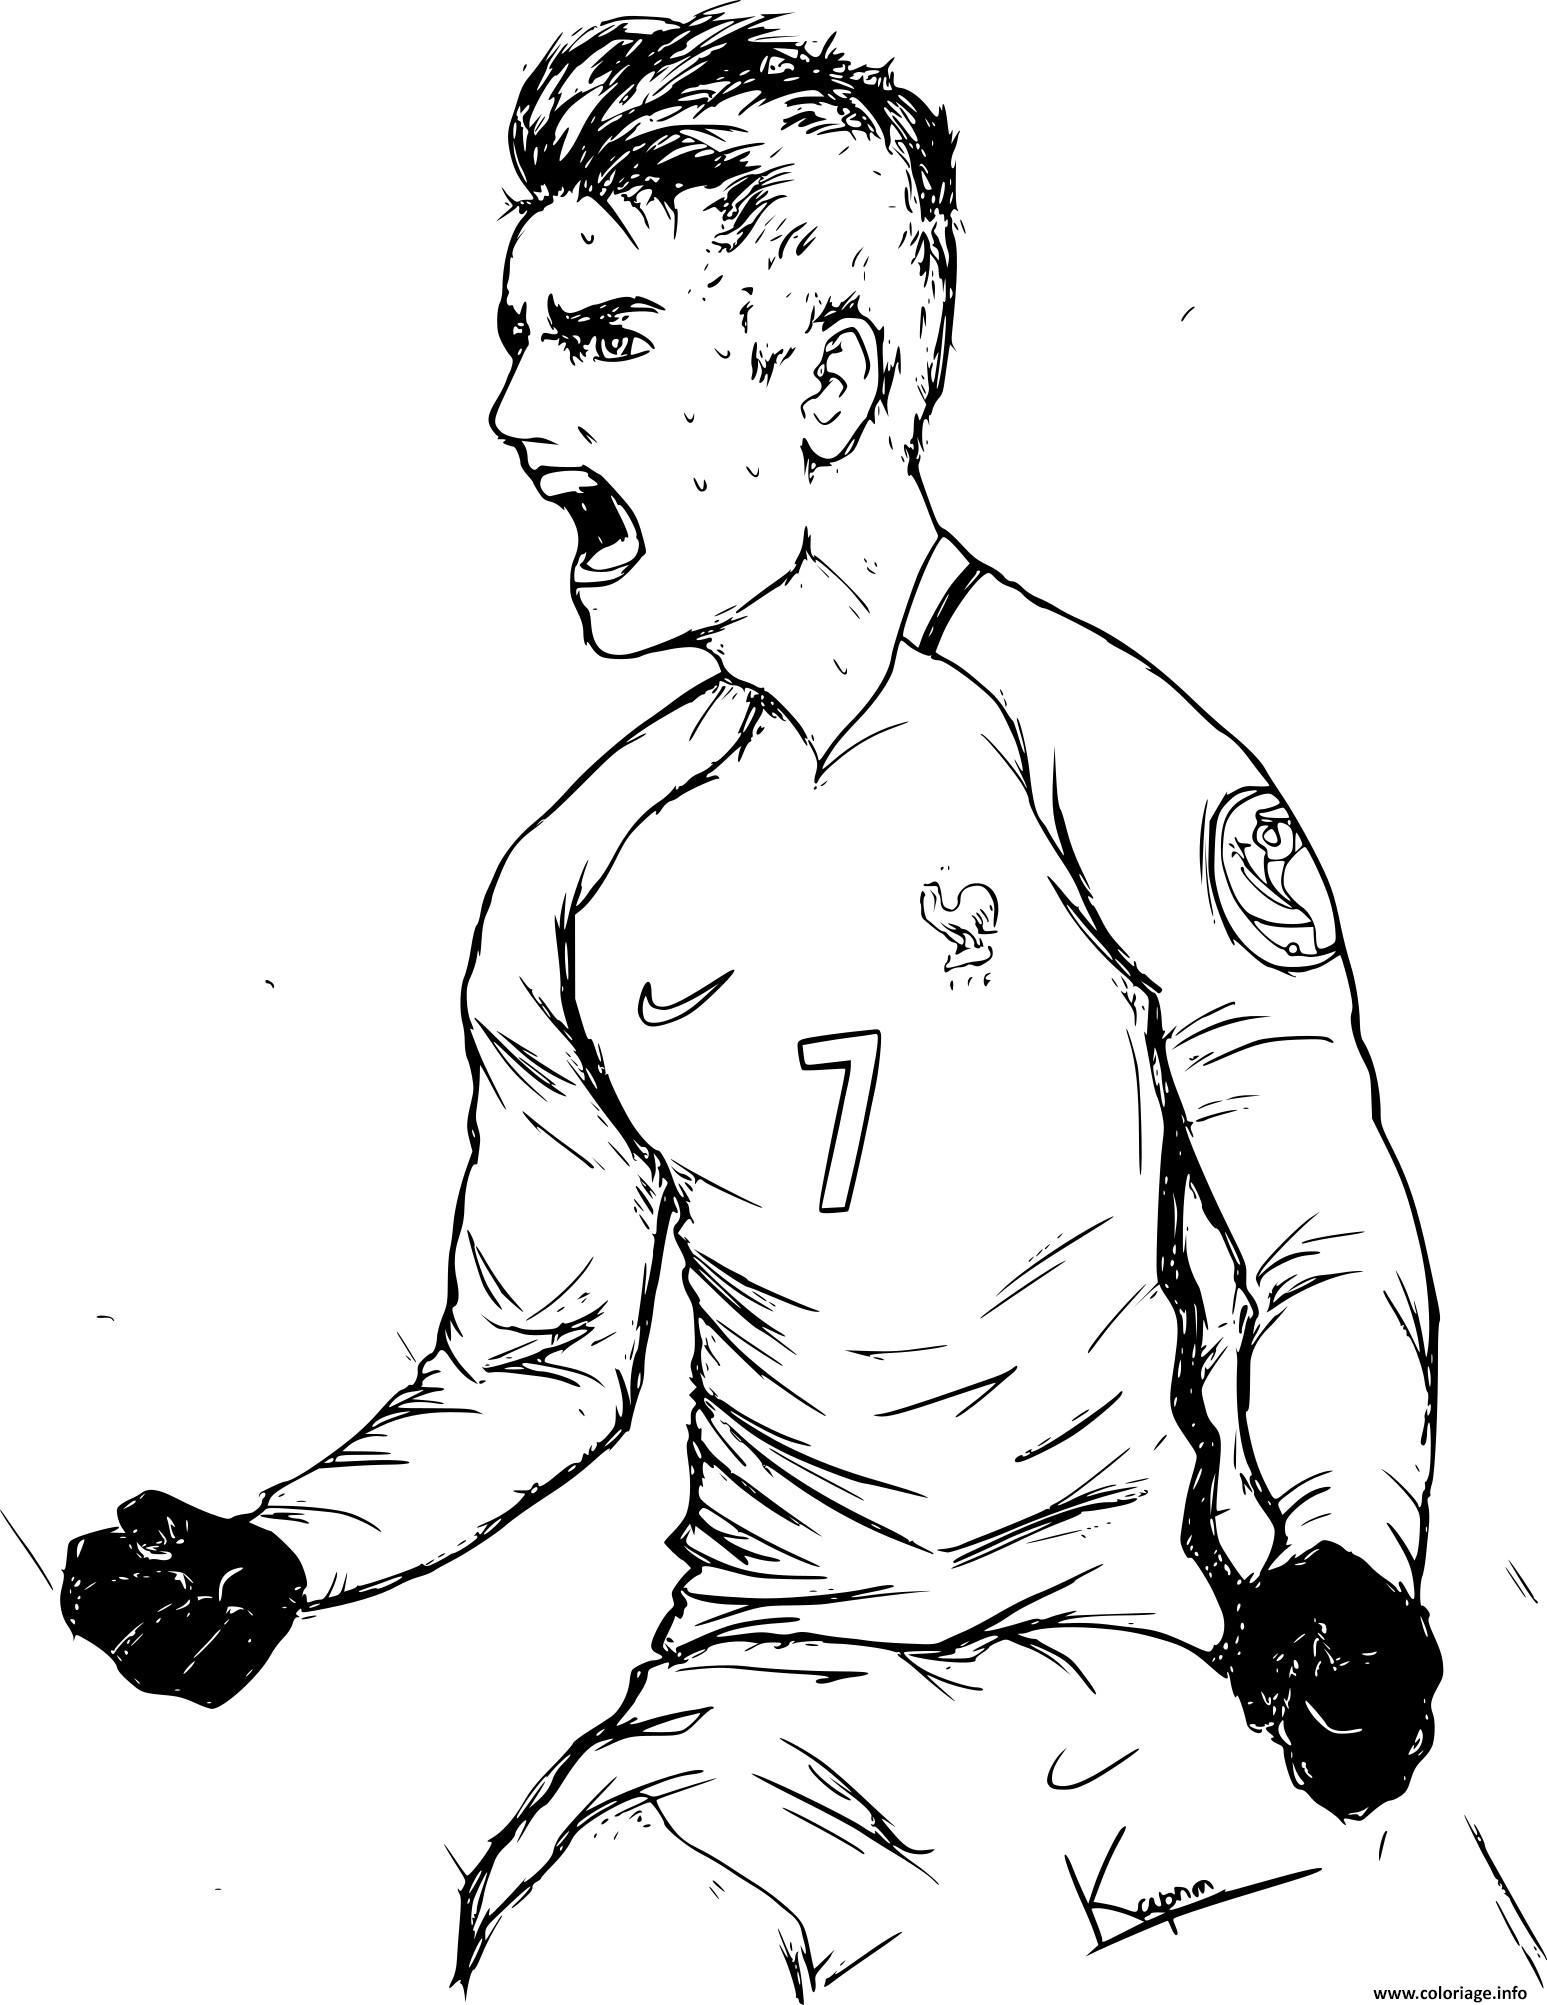 Coloriage joueur de foot antoine griezmann equipe de - Dessin equipe de foot ...